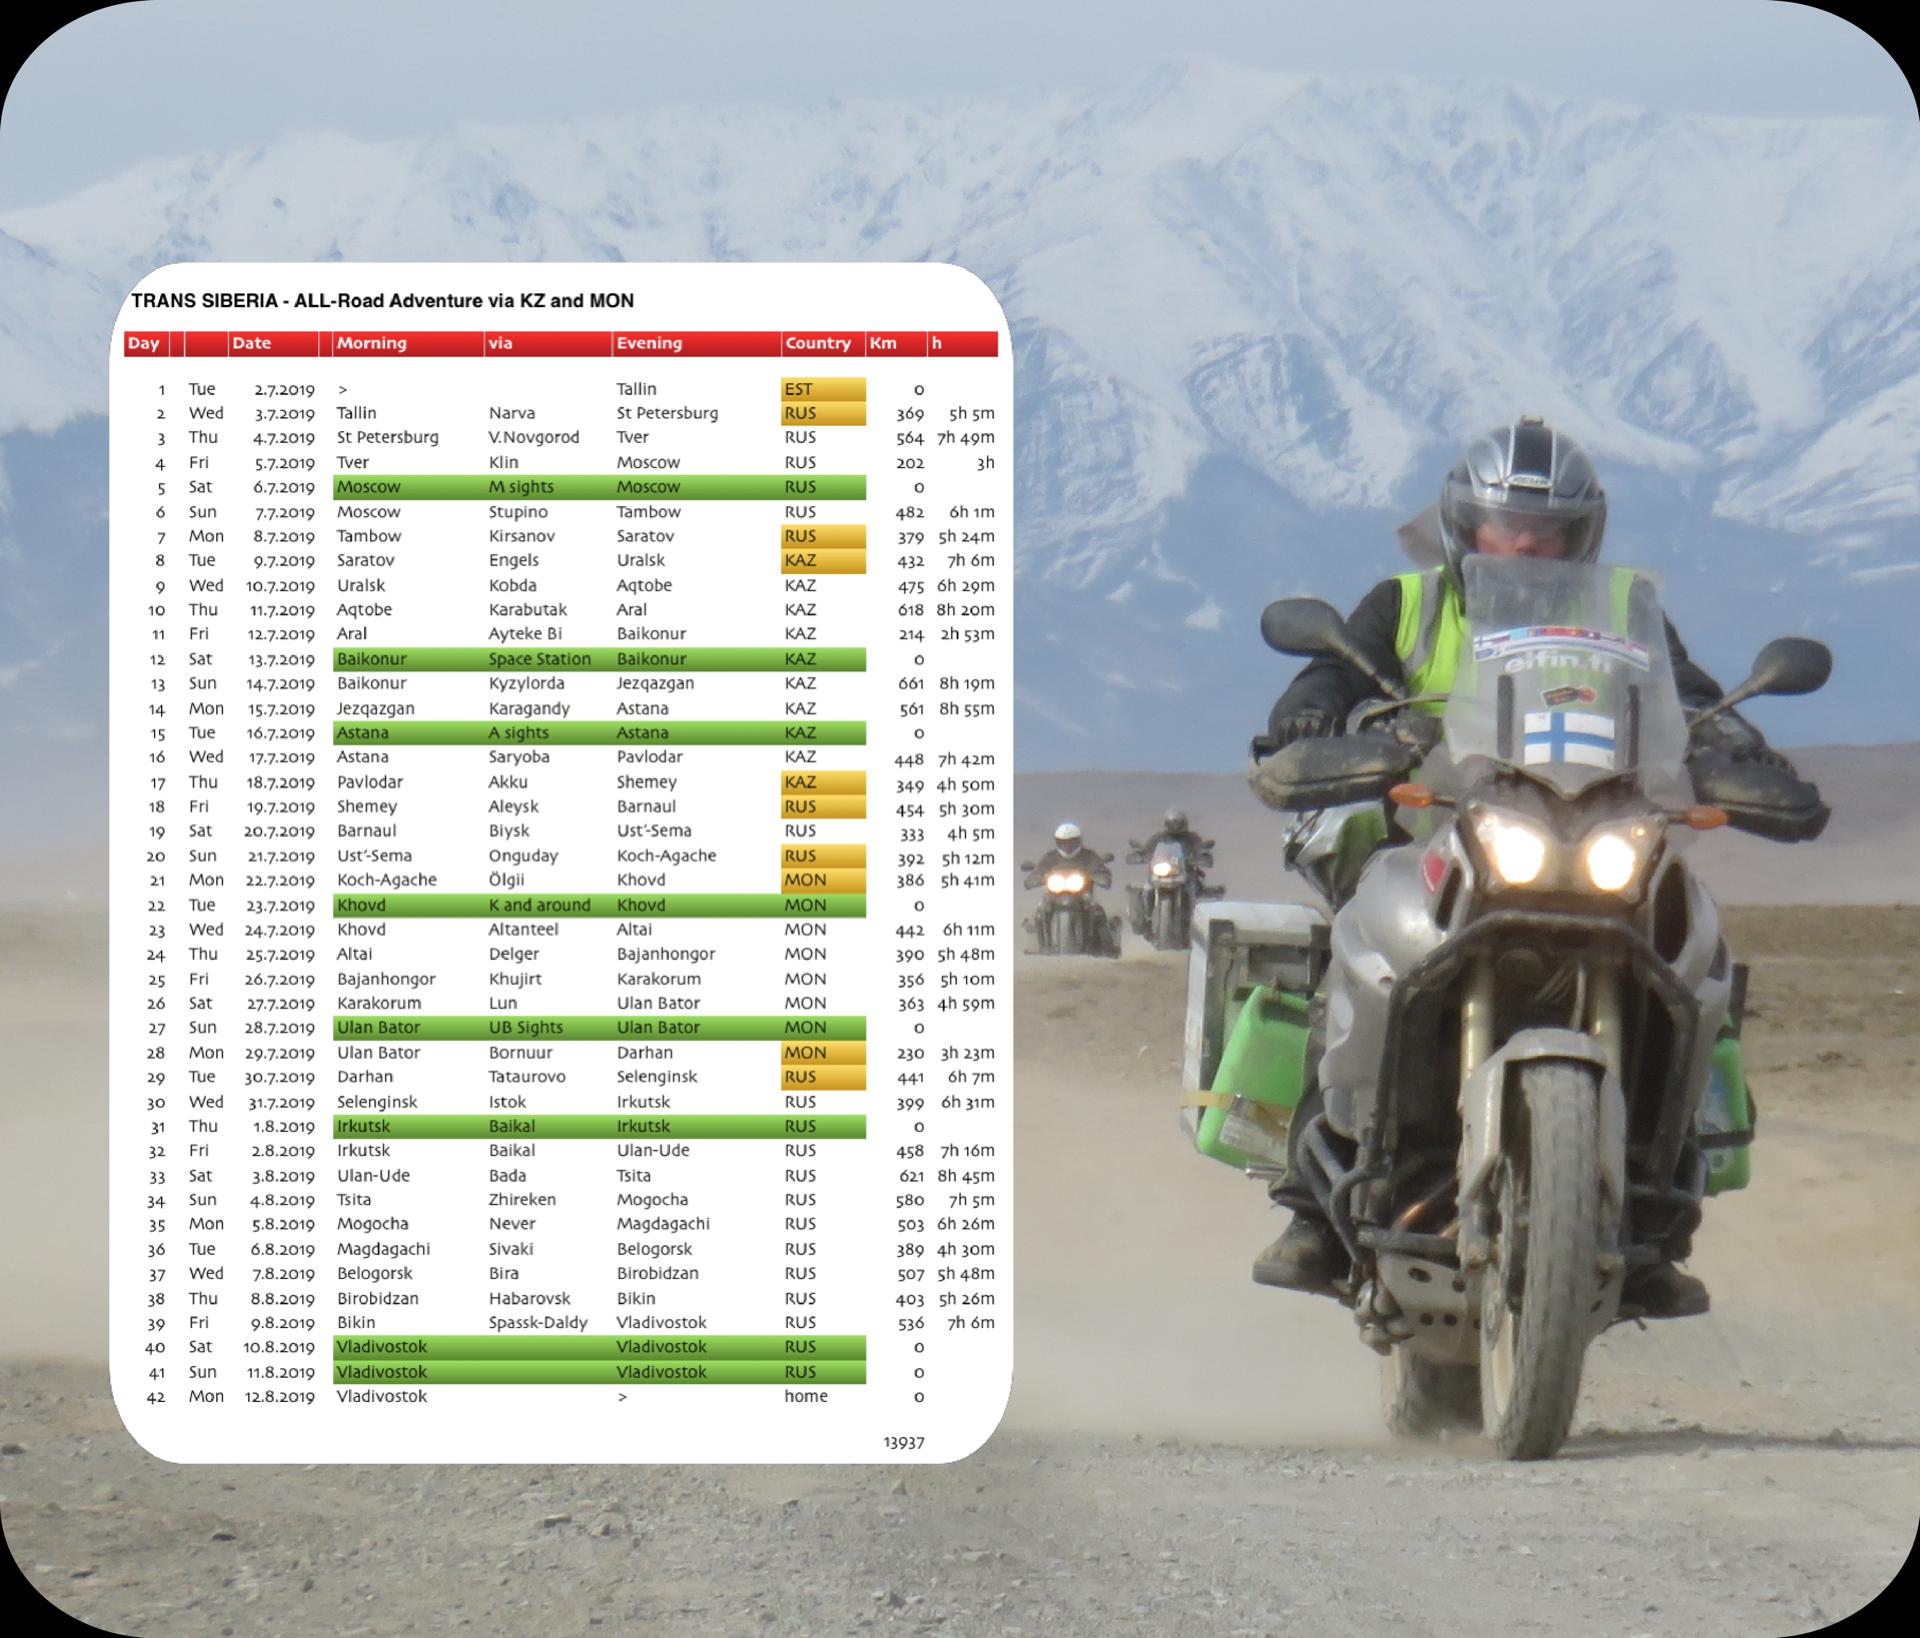 Trans Siberia motorcycle adventure!